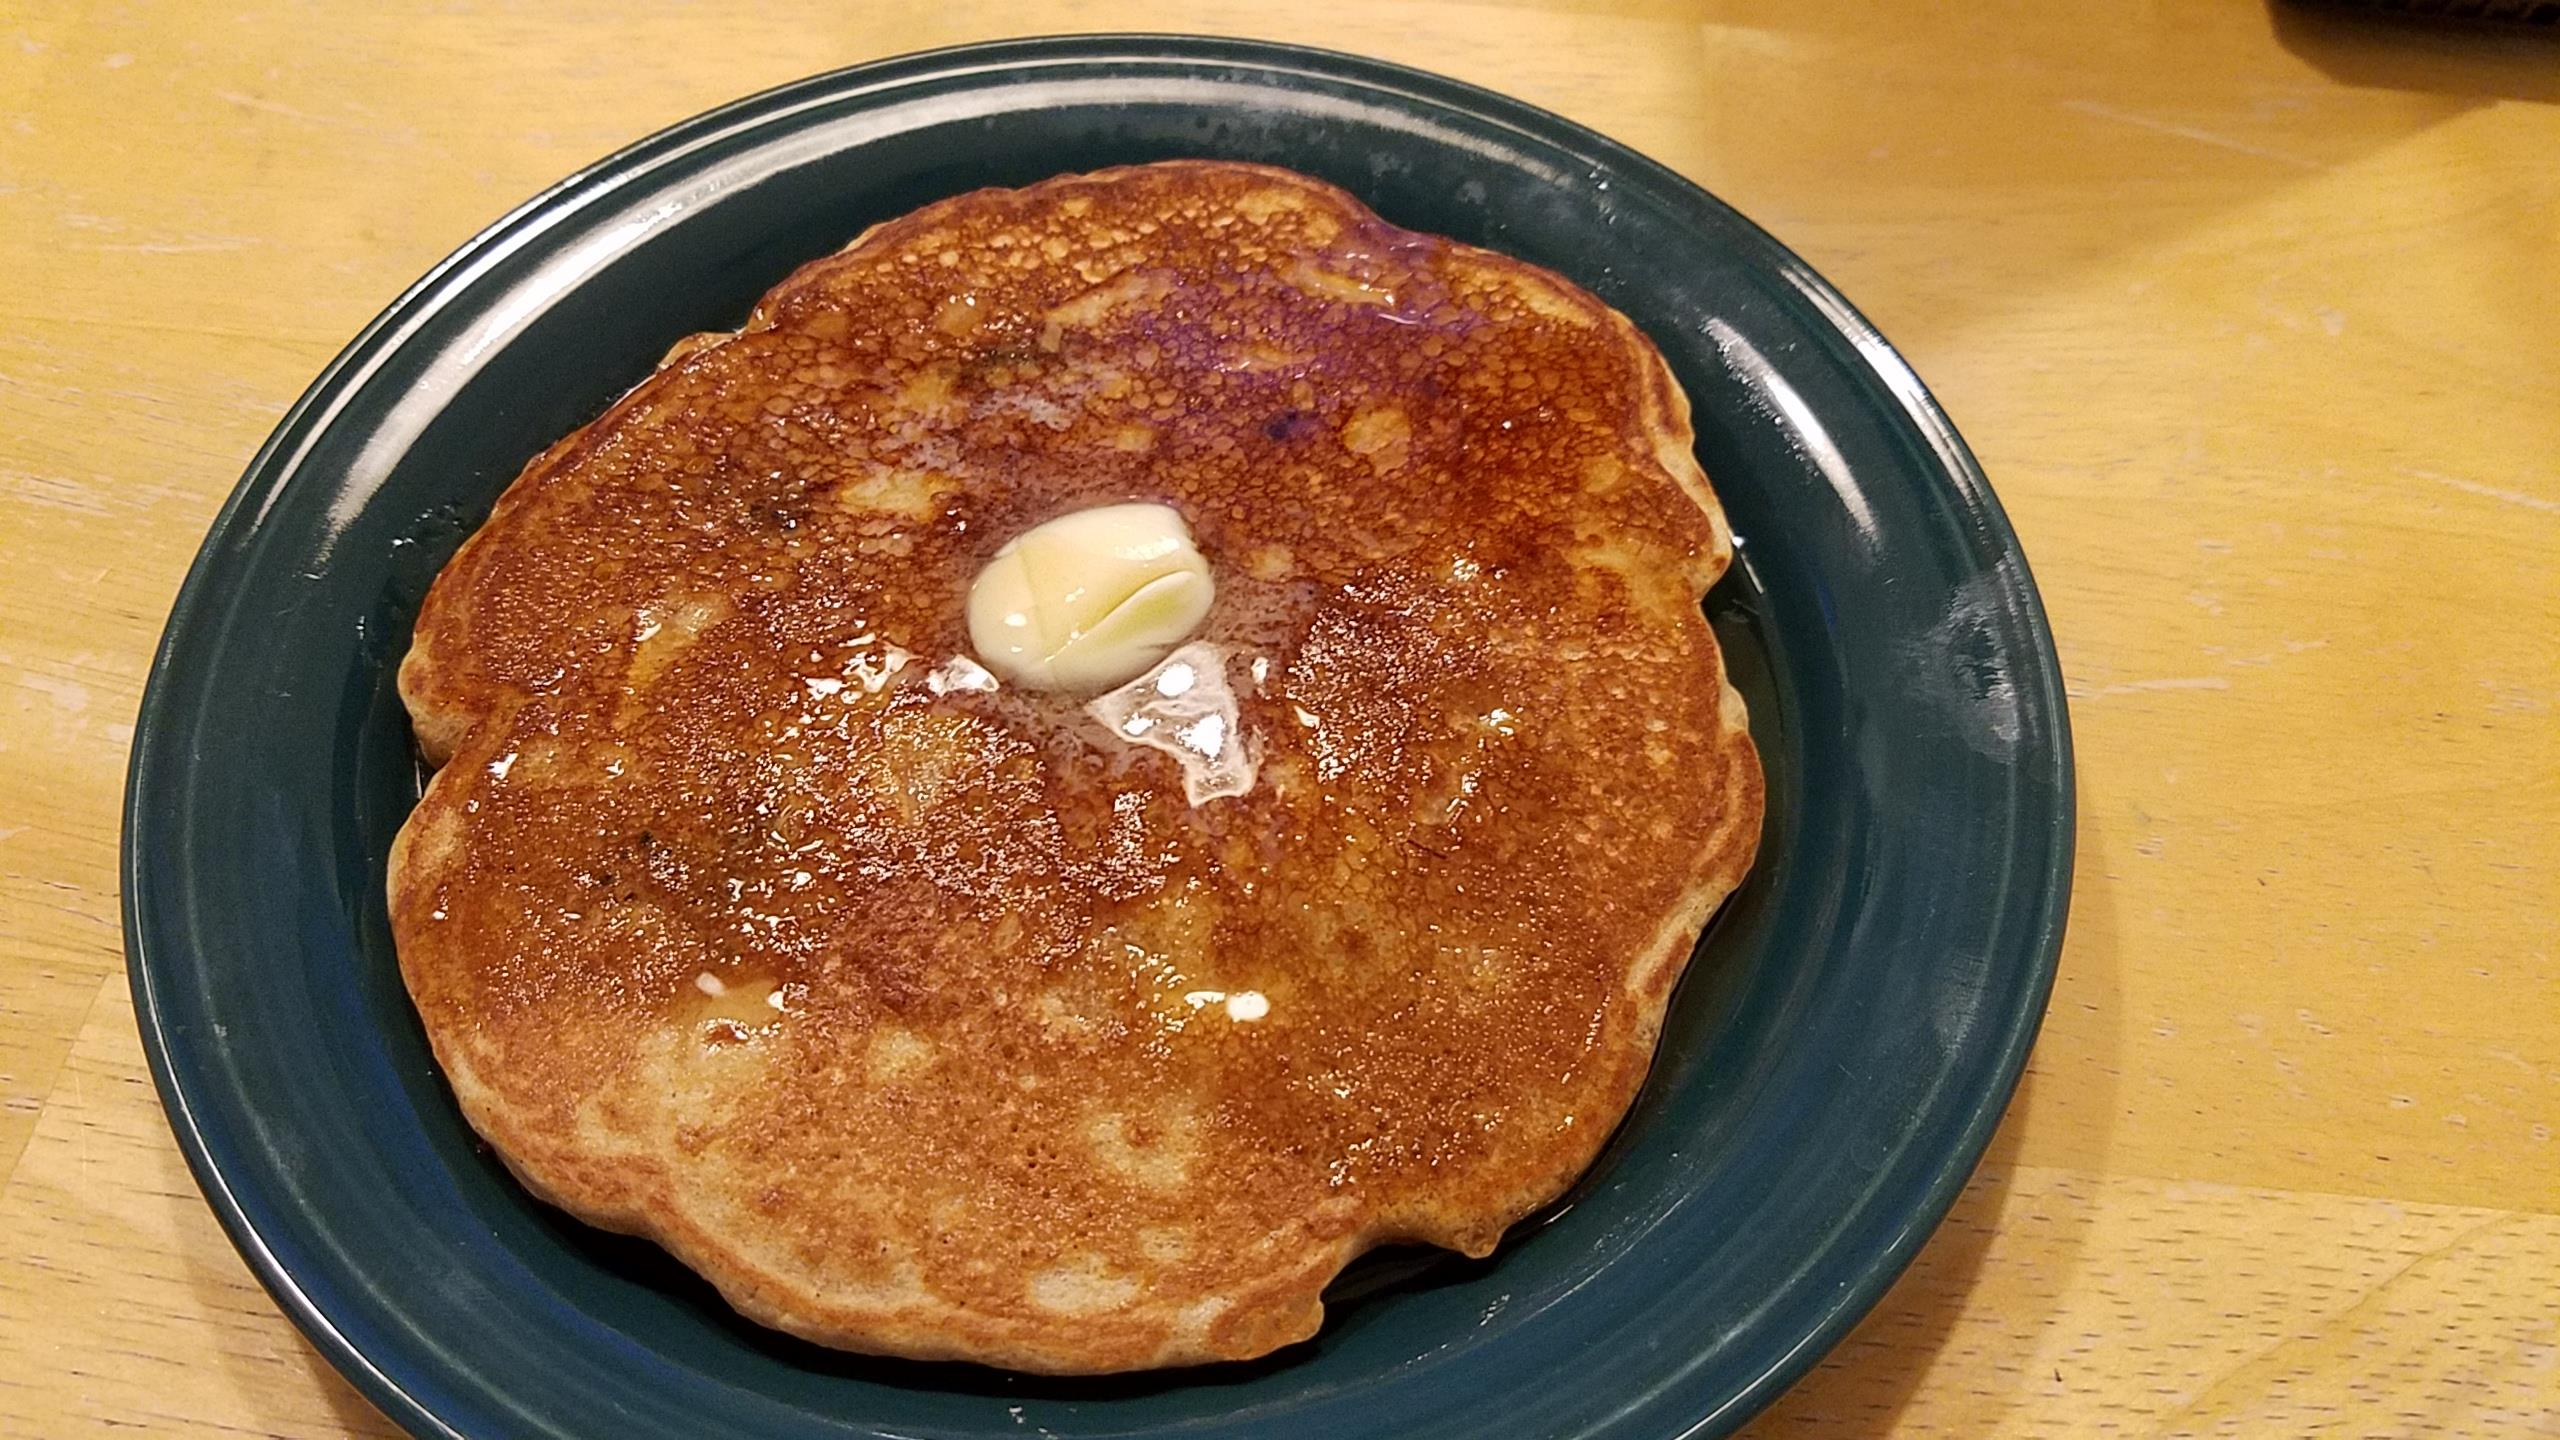 100% Whole Wheat Harvest Pancakes